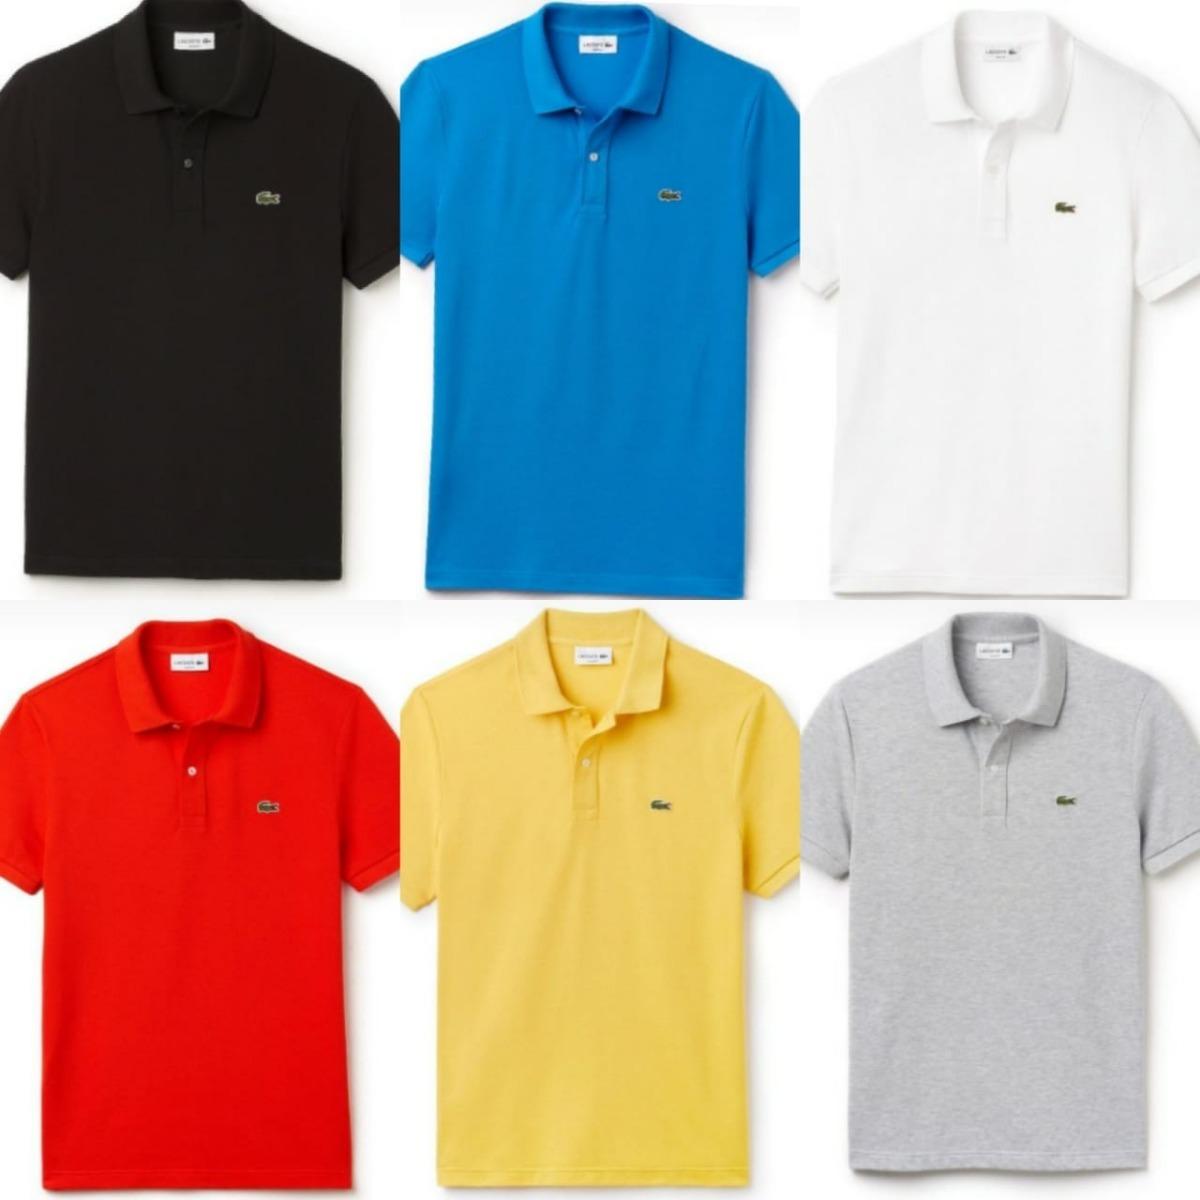 e445756e144bb Hiper Barato Kit 5 Camisas Polo Masculina Lacoste - R  189